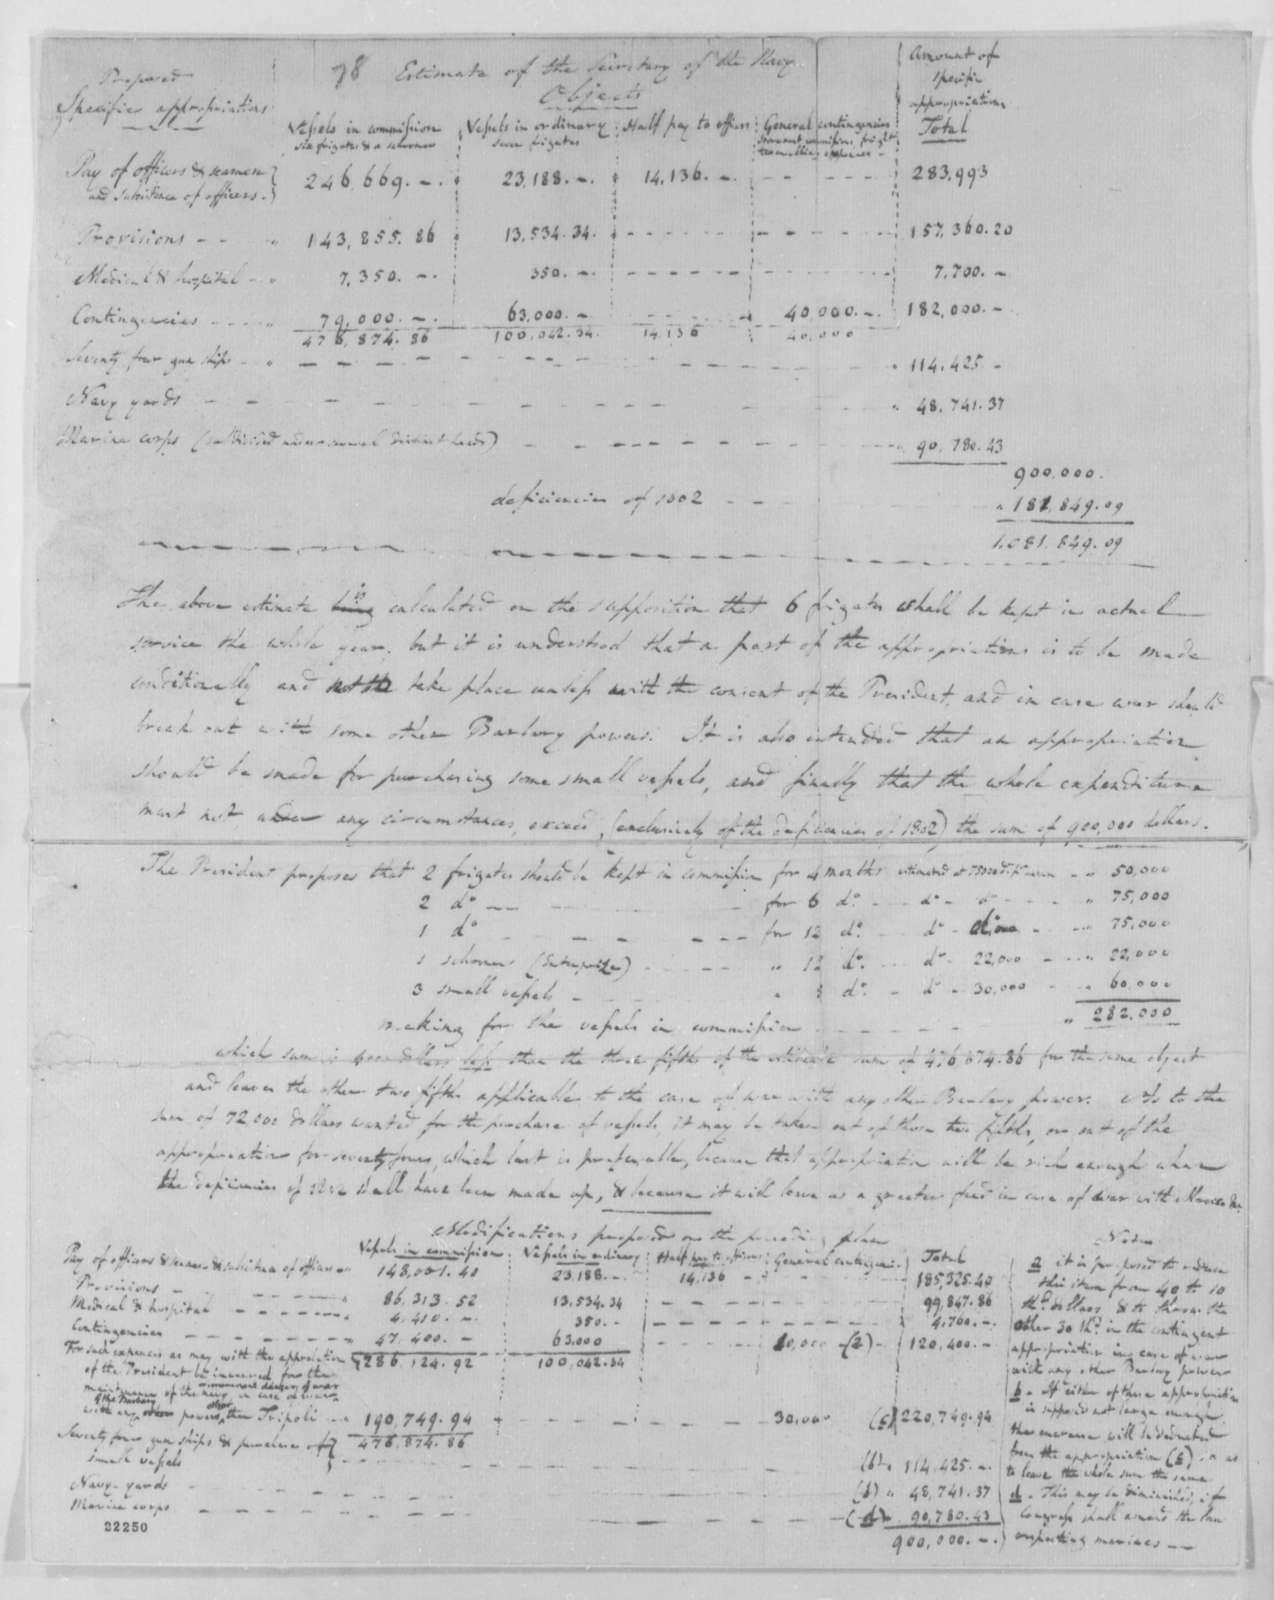 Albert Gallatin, January 22, 1803, U. S. Secretary of Navy Estimates